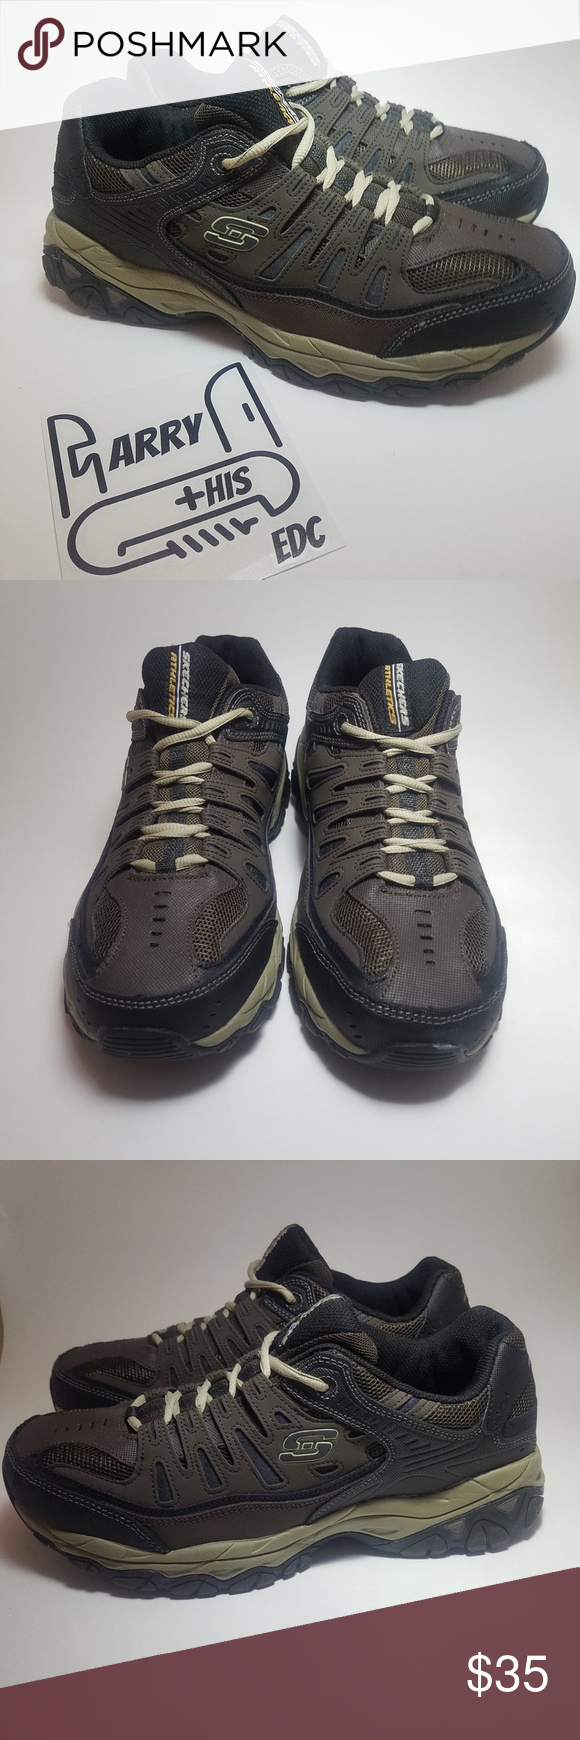 Skechers Mens Shoe SN 50125EWW Color